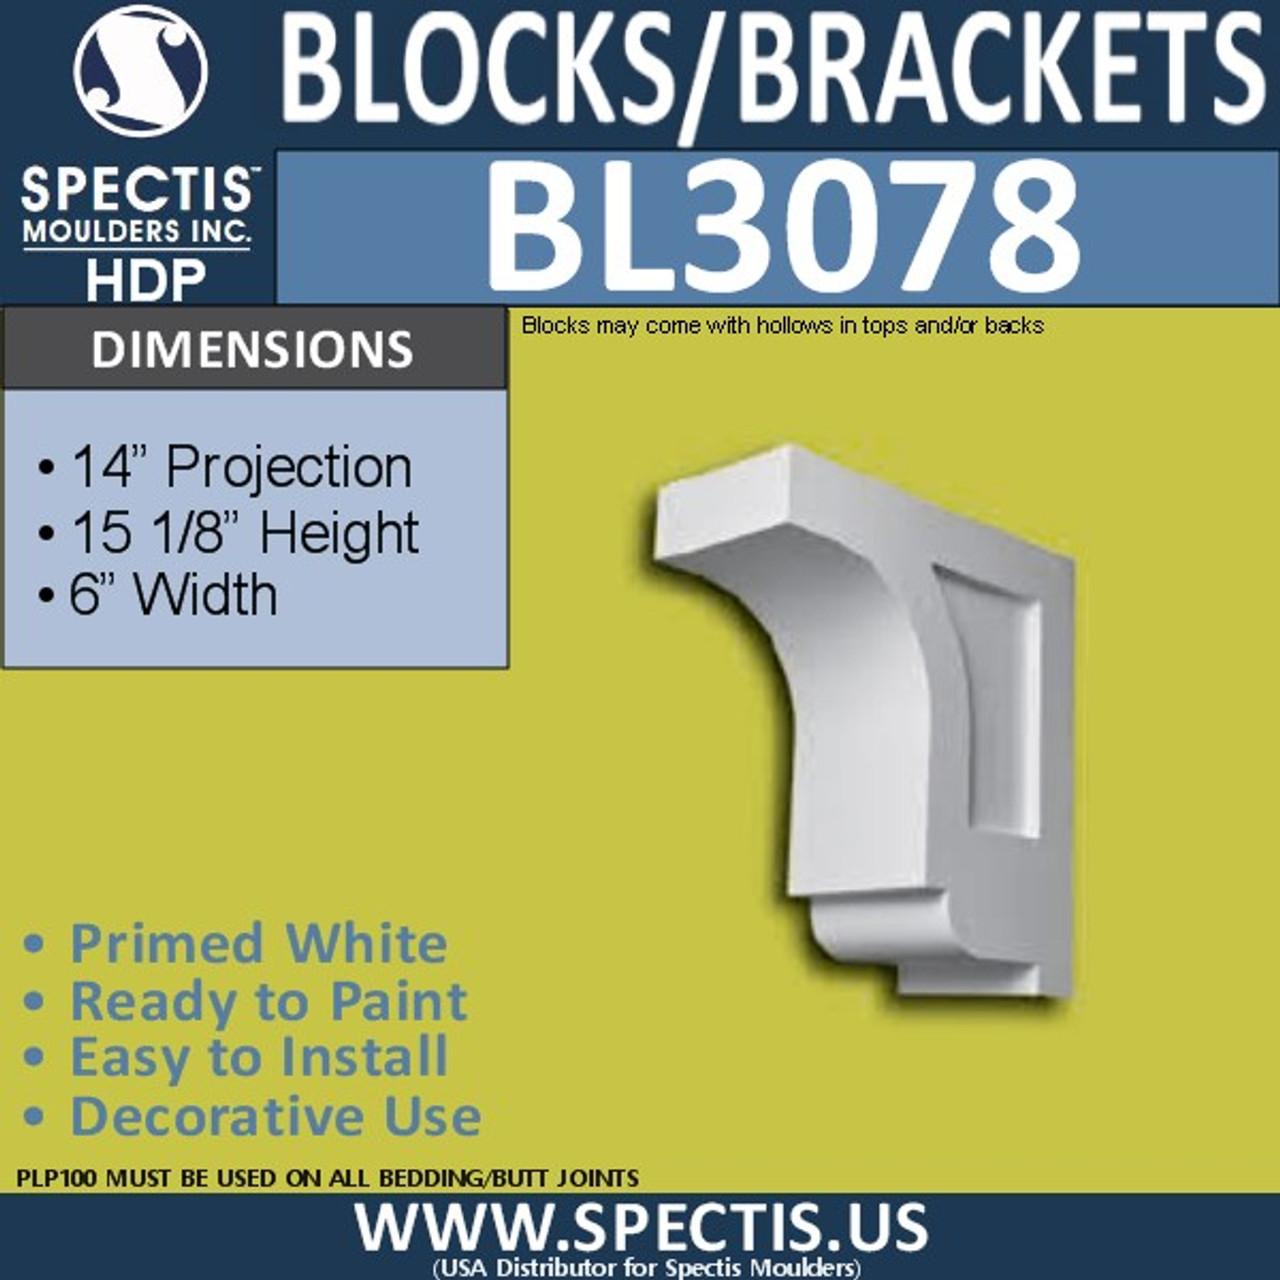 "BL3078 Eave Block or Bracket 6""W x 15.13""H x 14"" P"